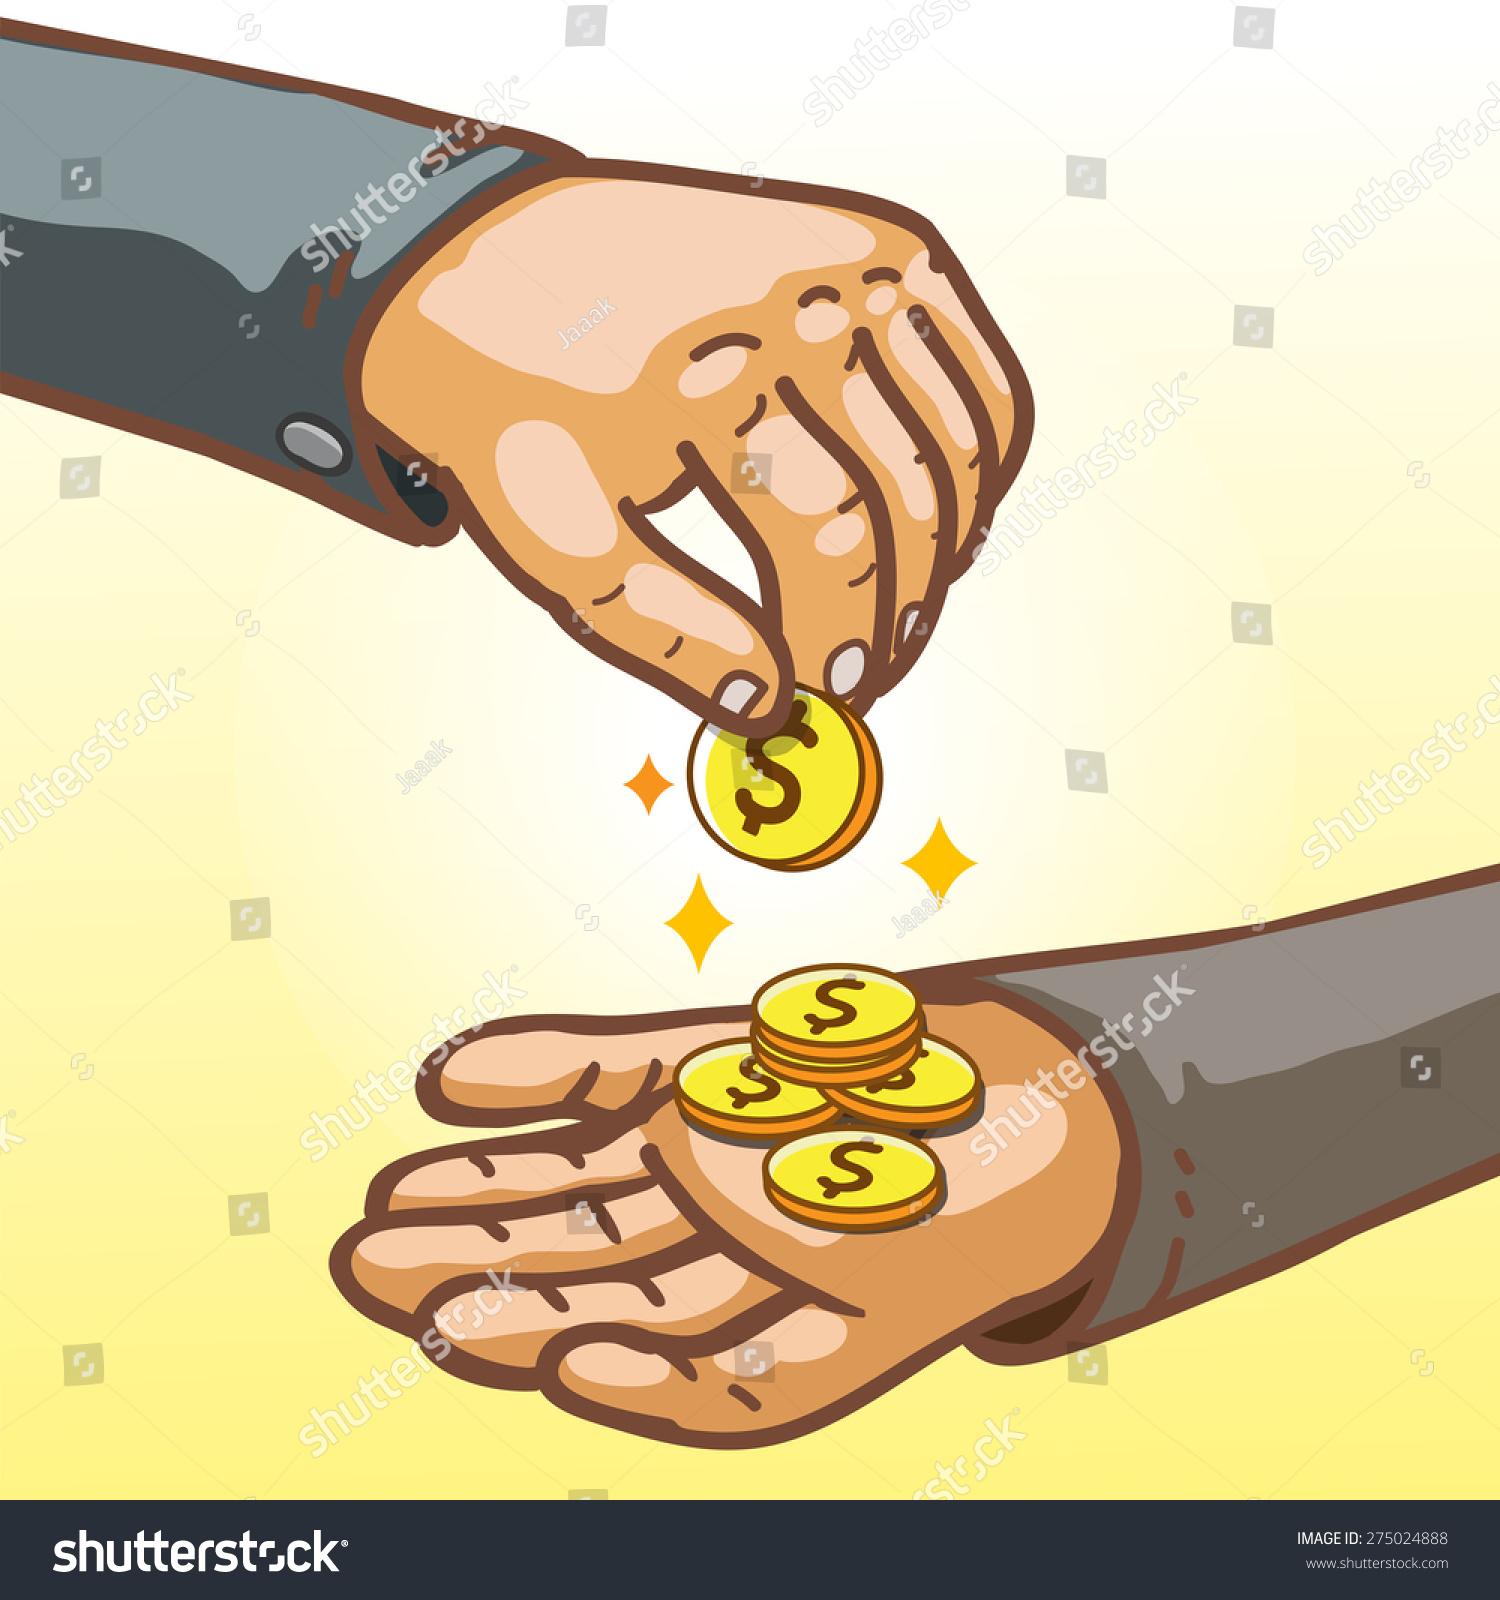 Cartoon Hands Giving Receiving Money Stock Vector (Royalty Free